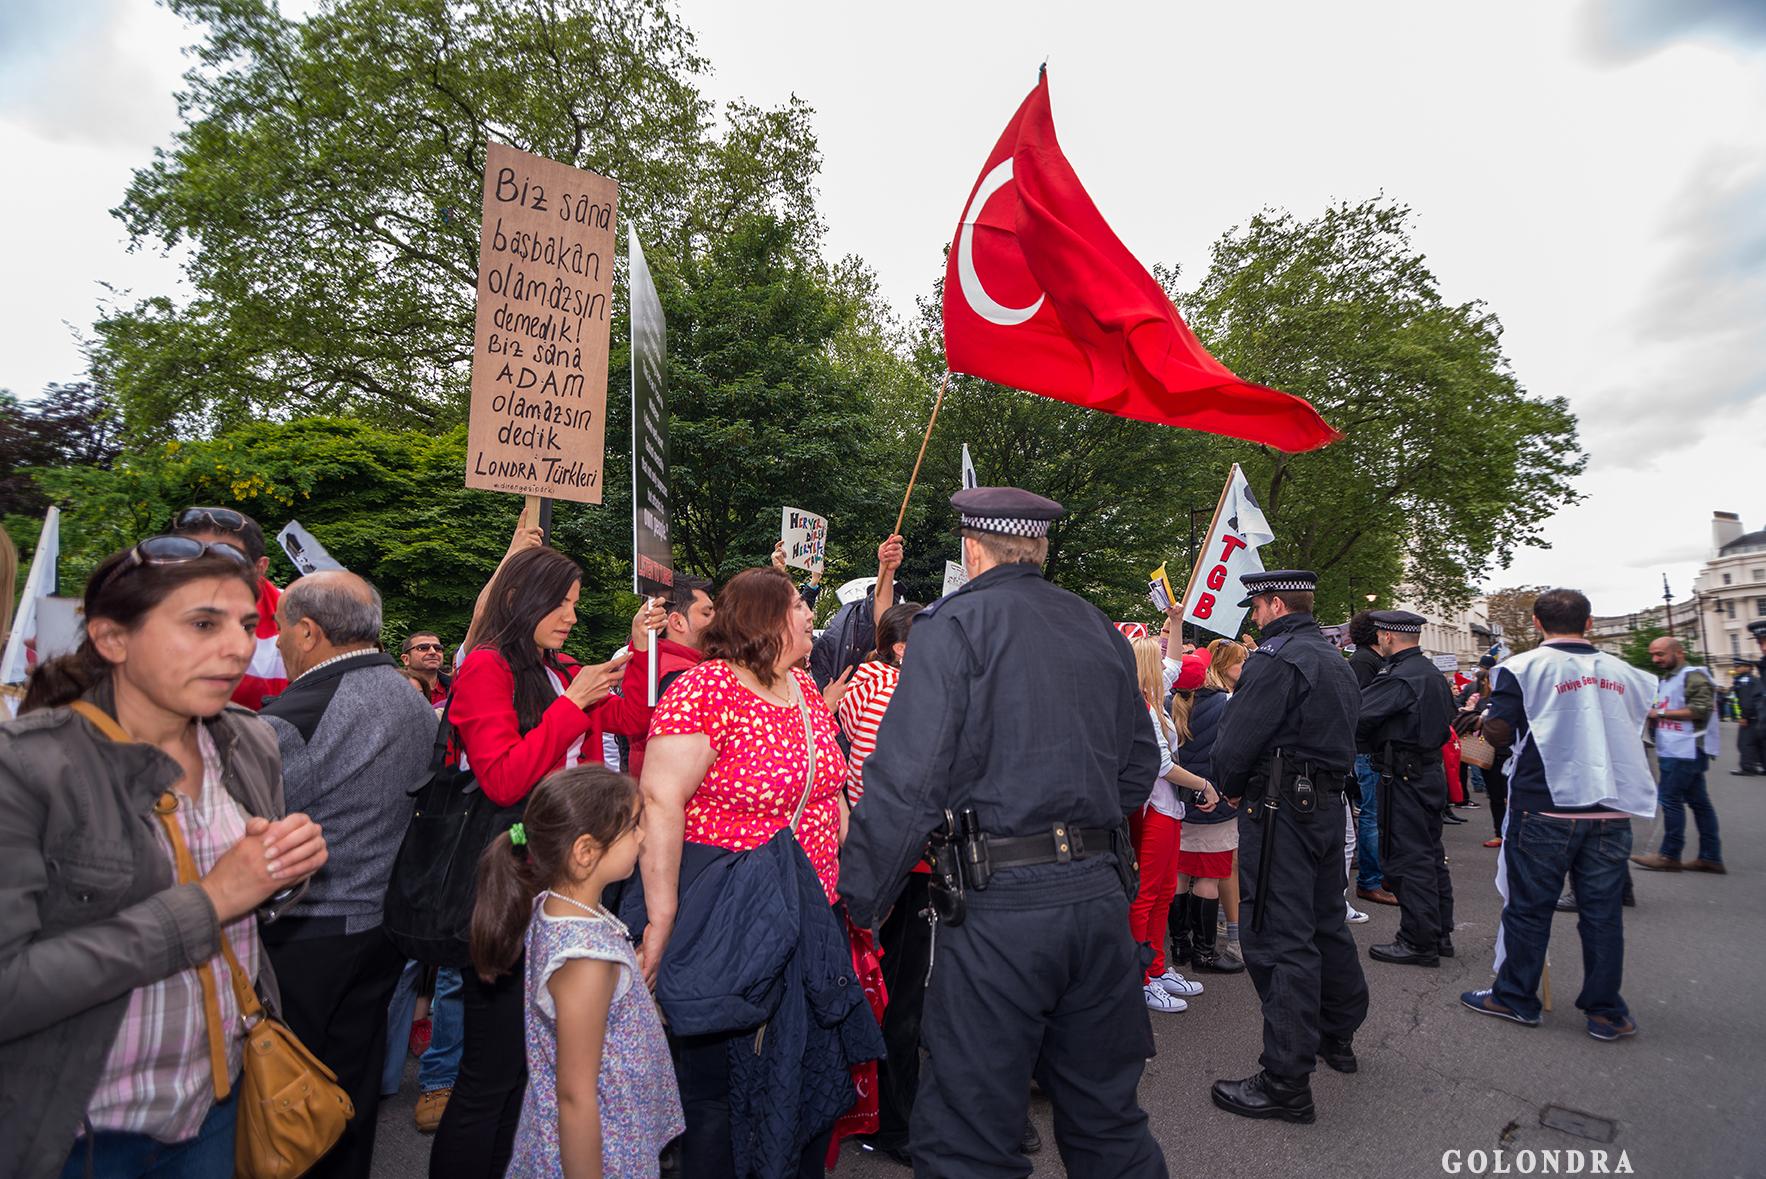 Protesting Turkish Government - Turk Hukumetini Protesto - Londra - London (39)